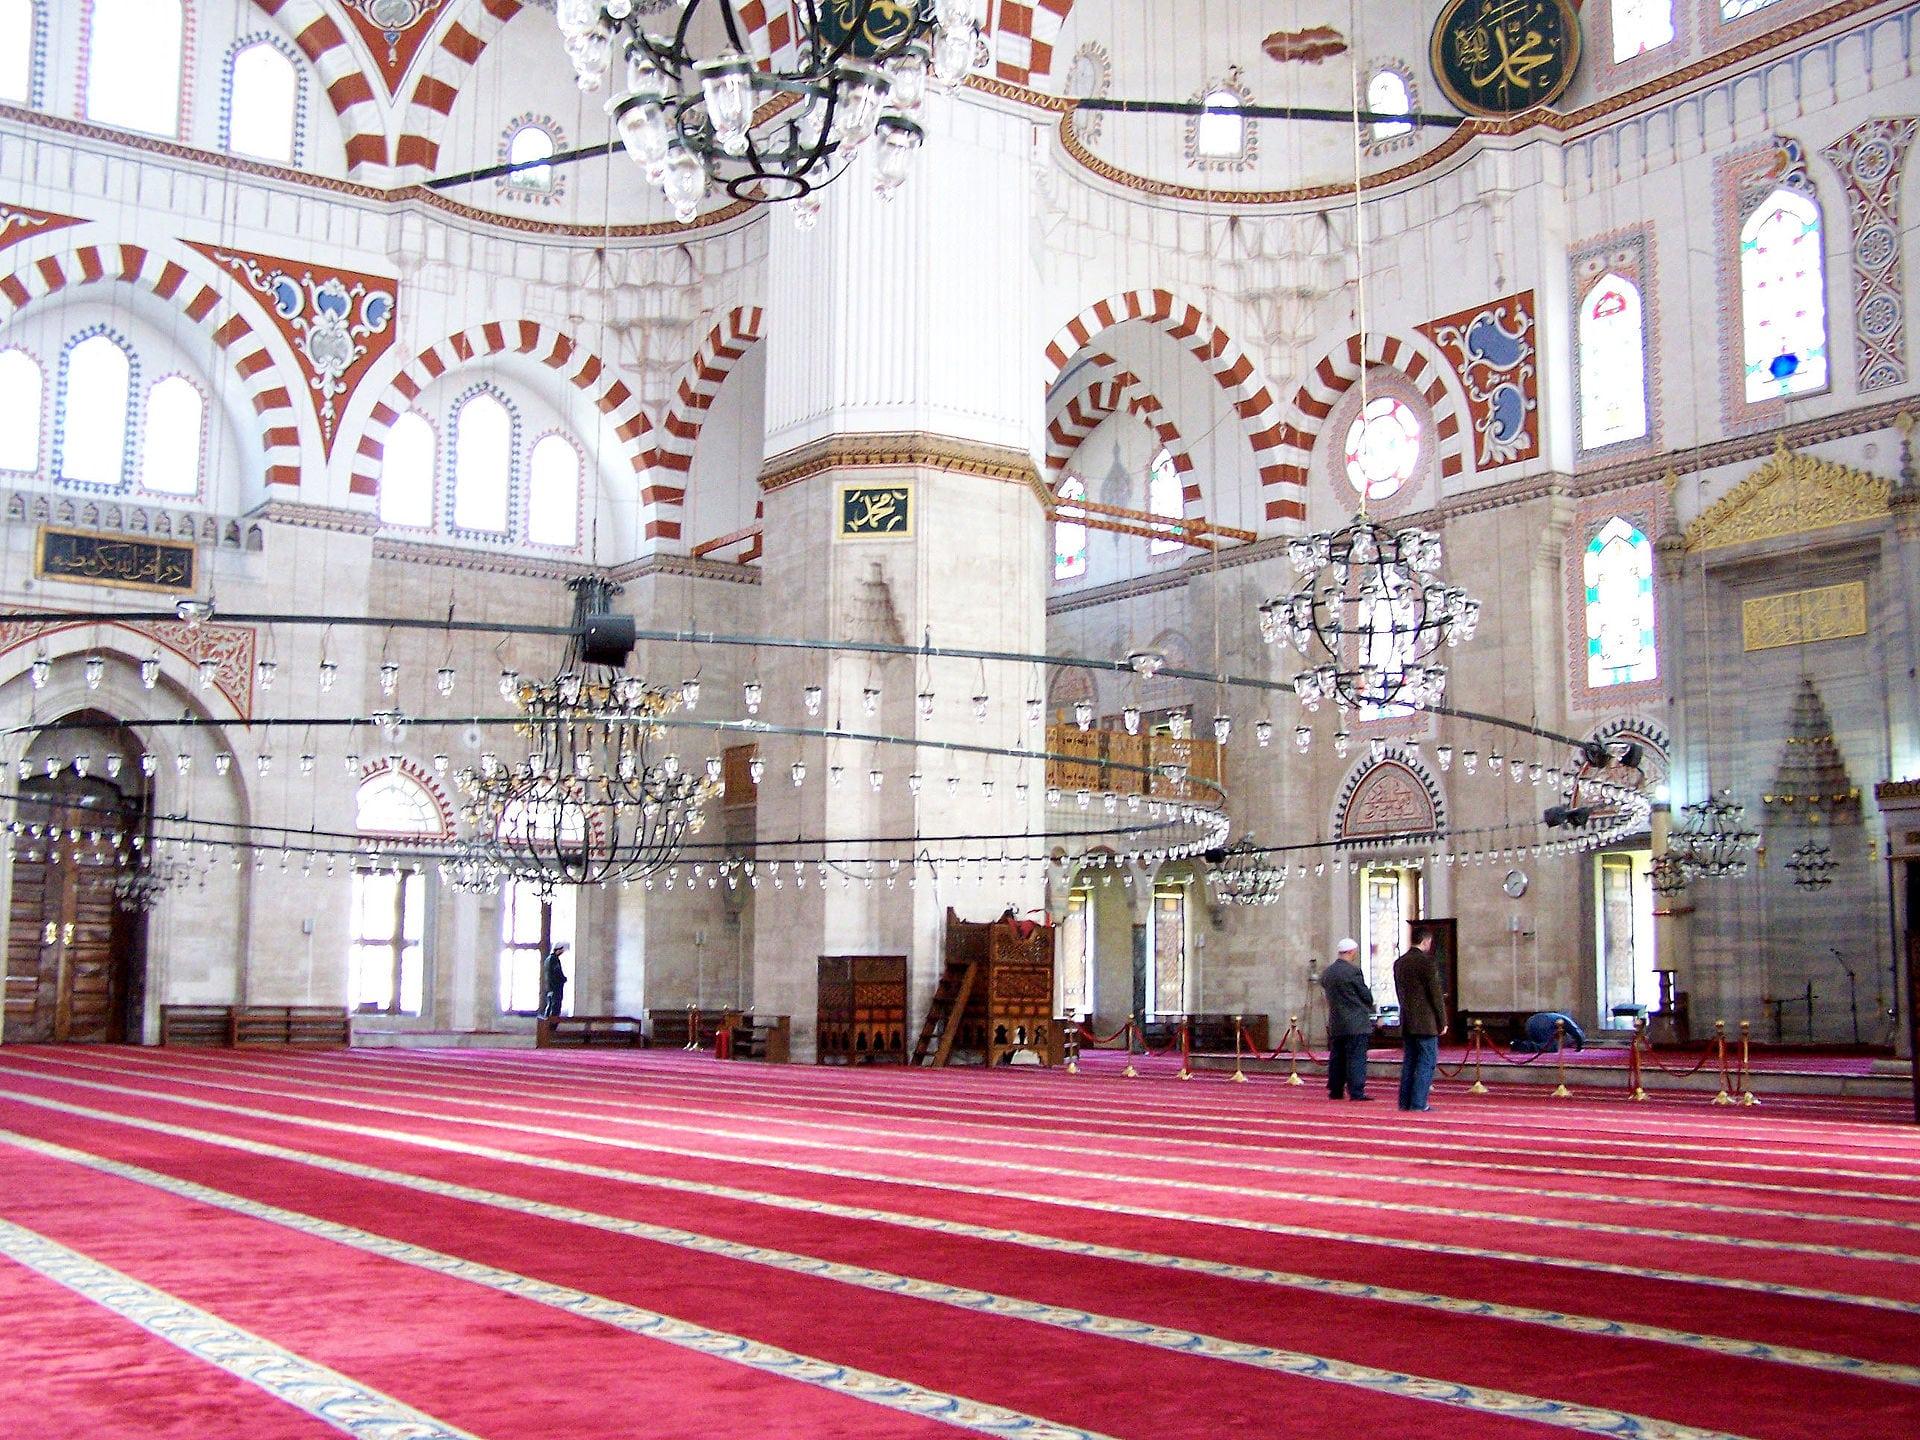 inside the Şehzade Mosque